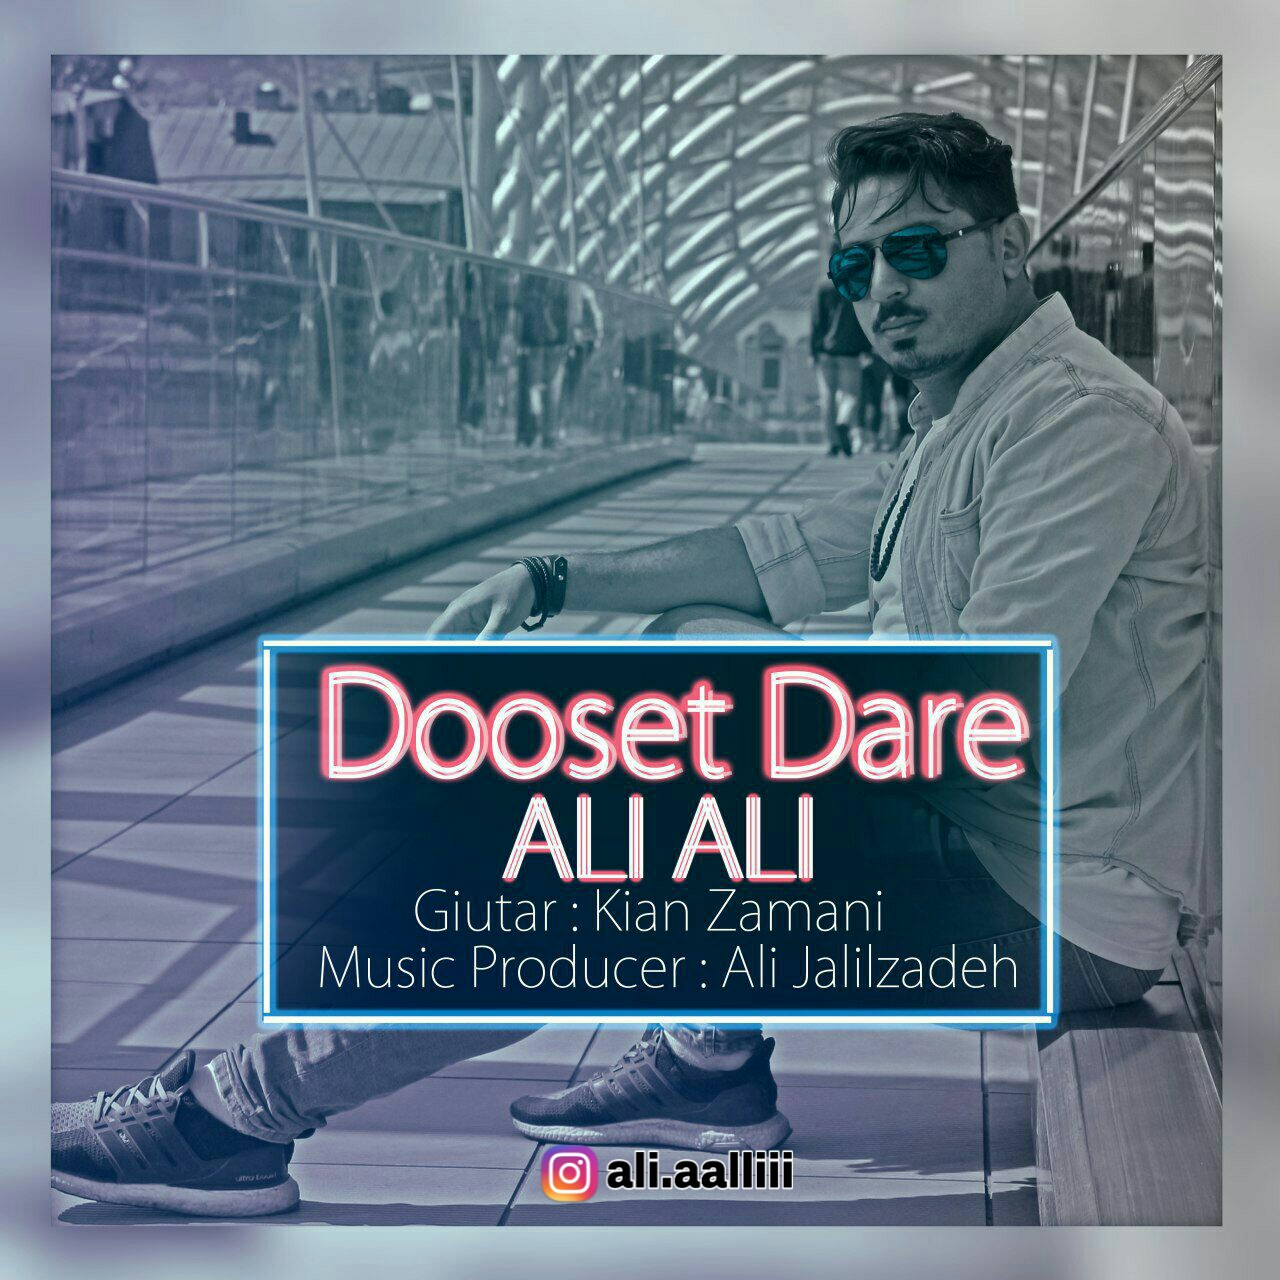 Ali Ali – Dooset Dare